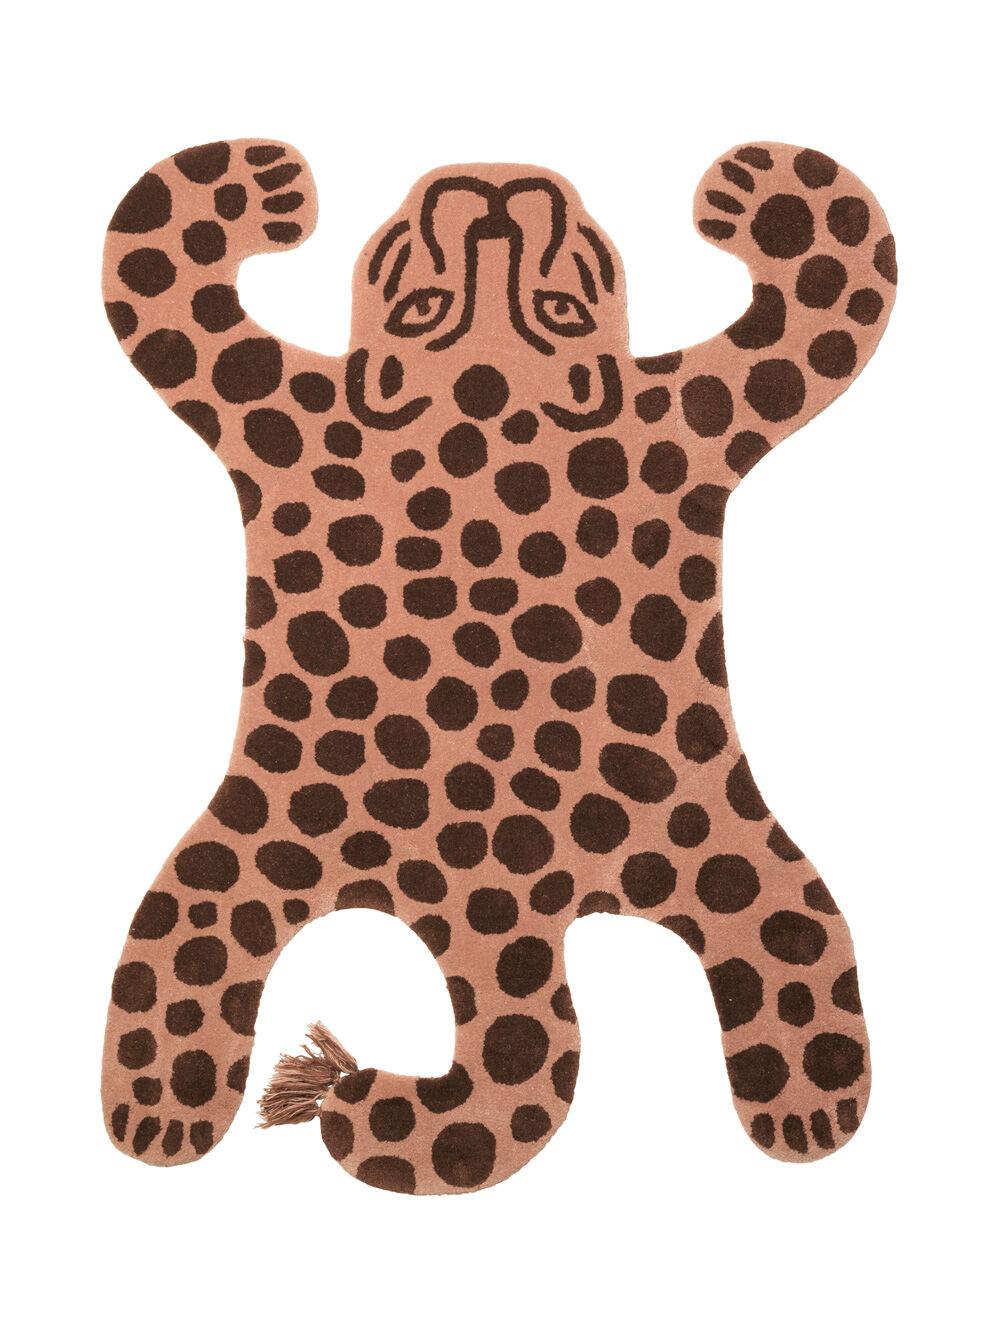 Ferm Living KIDS Safari Tufted Rug, Leopard